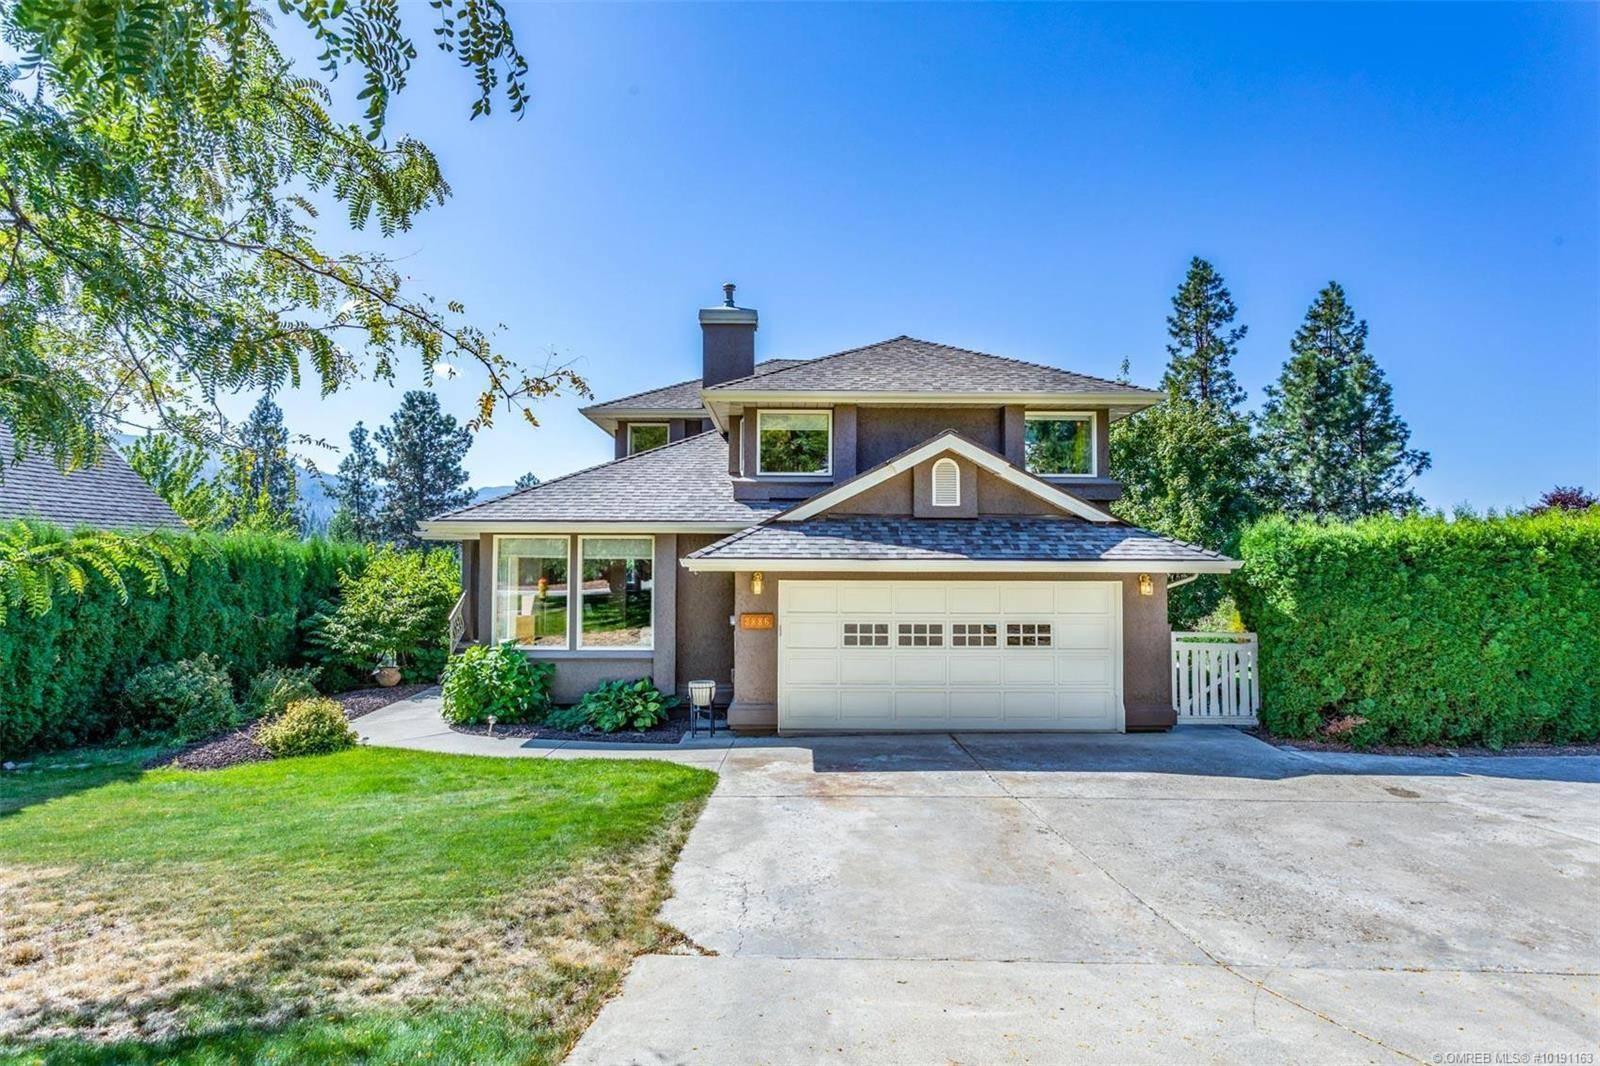 House for sale at 3886 Hyak Rd Kelowna British Columbia - MLS: 10191163